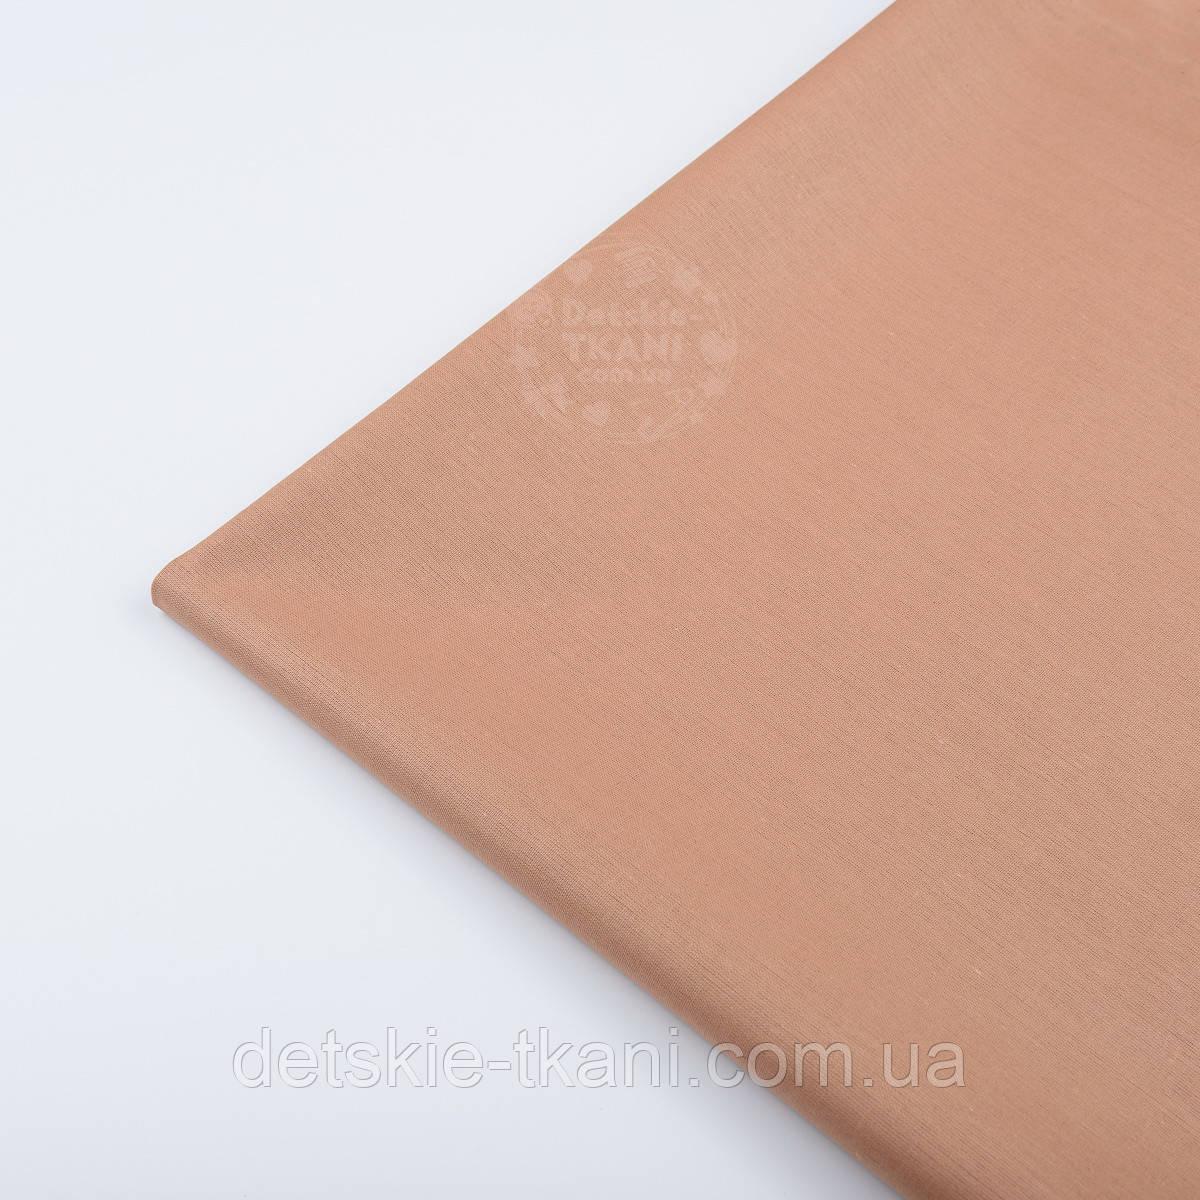 Лоскут ткани коричнево-медного цвета, №1249, размер 48*60 см